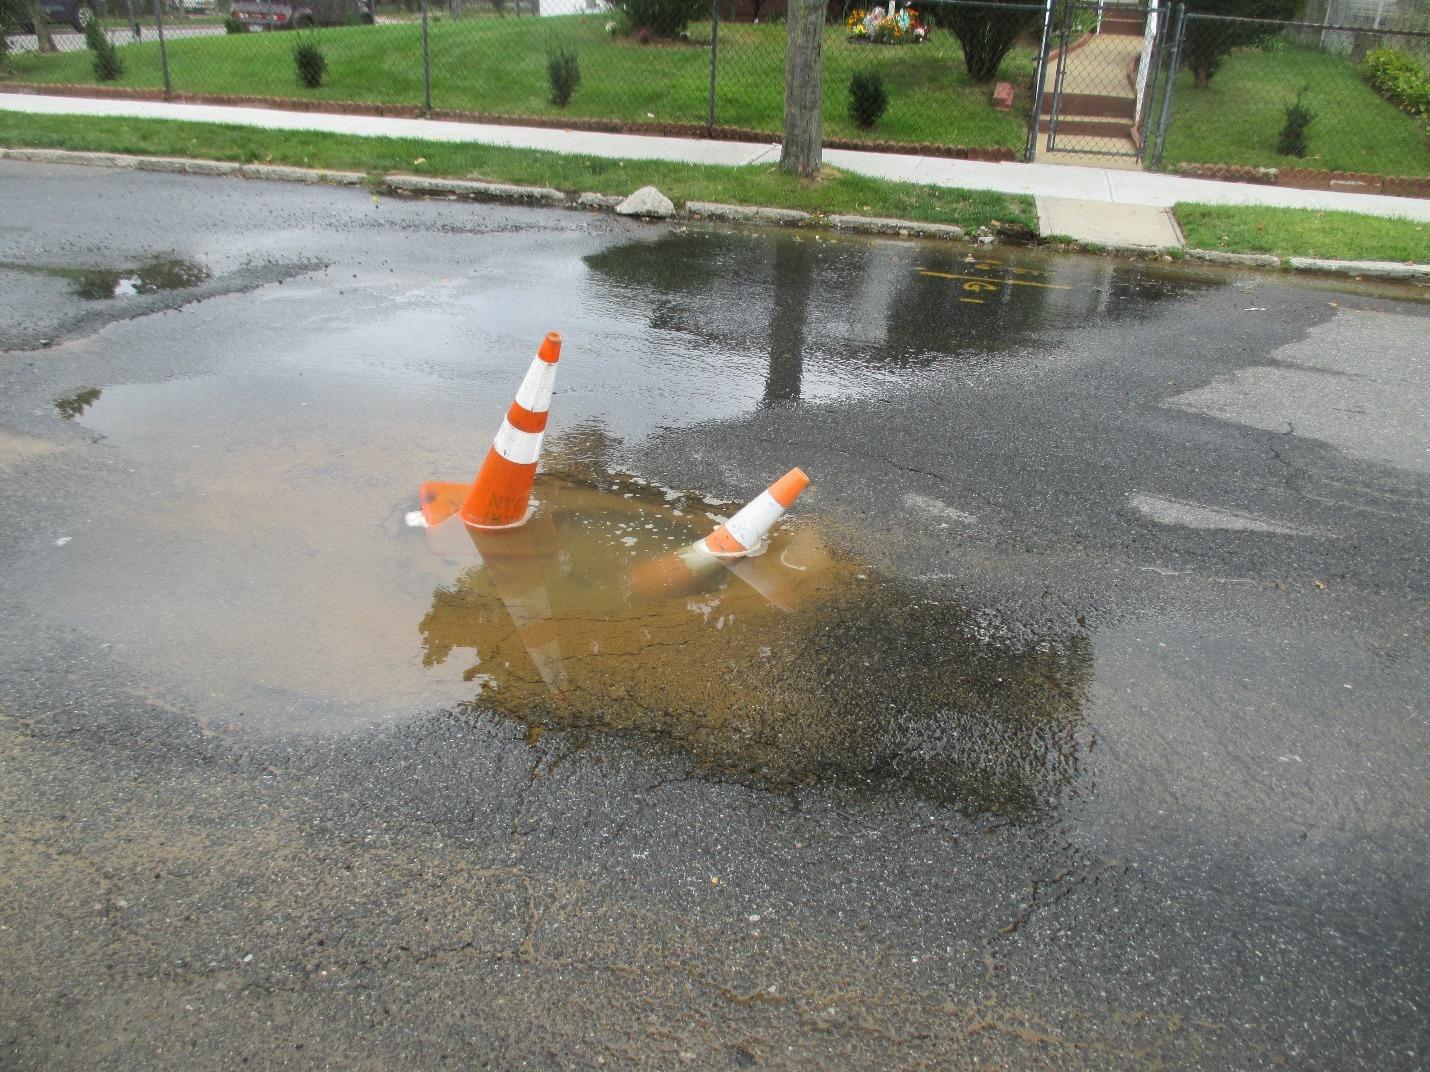 sprinkler leak in NYC roadway